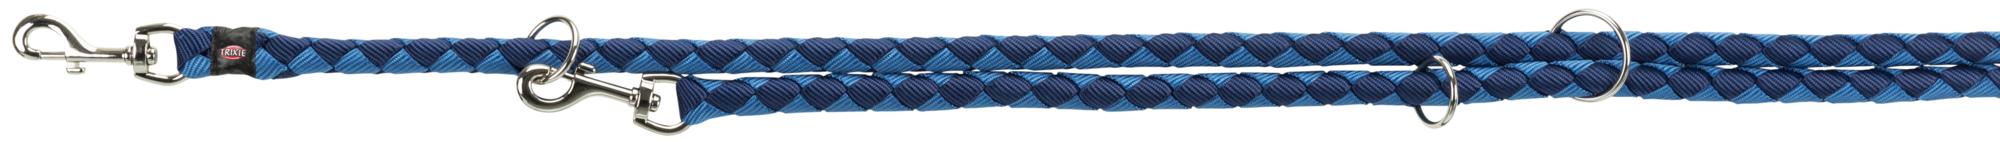 TRIXIE Cavo V-Leine TRIXIE Cavo V-Leine, L–XL: 2,00 m/ø 18 mm, indigo/royalblau